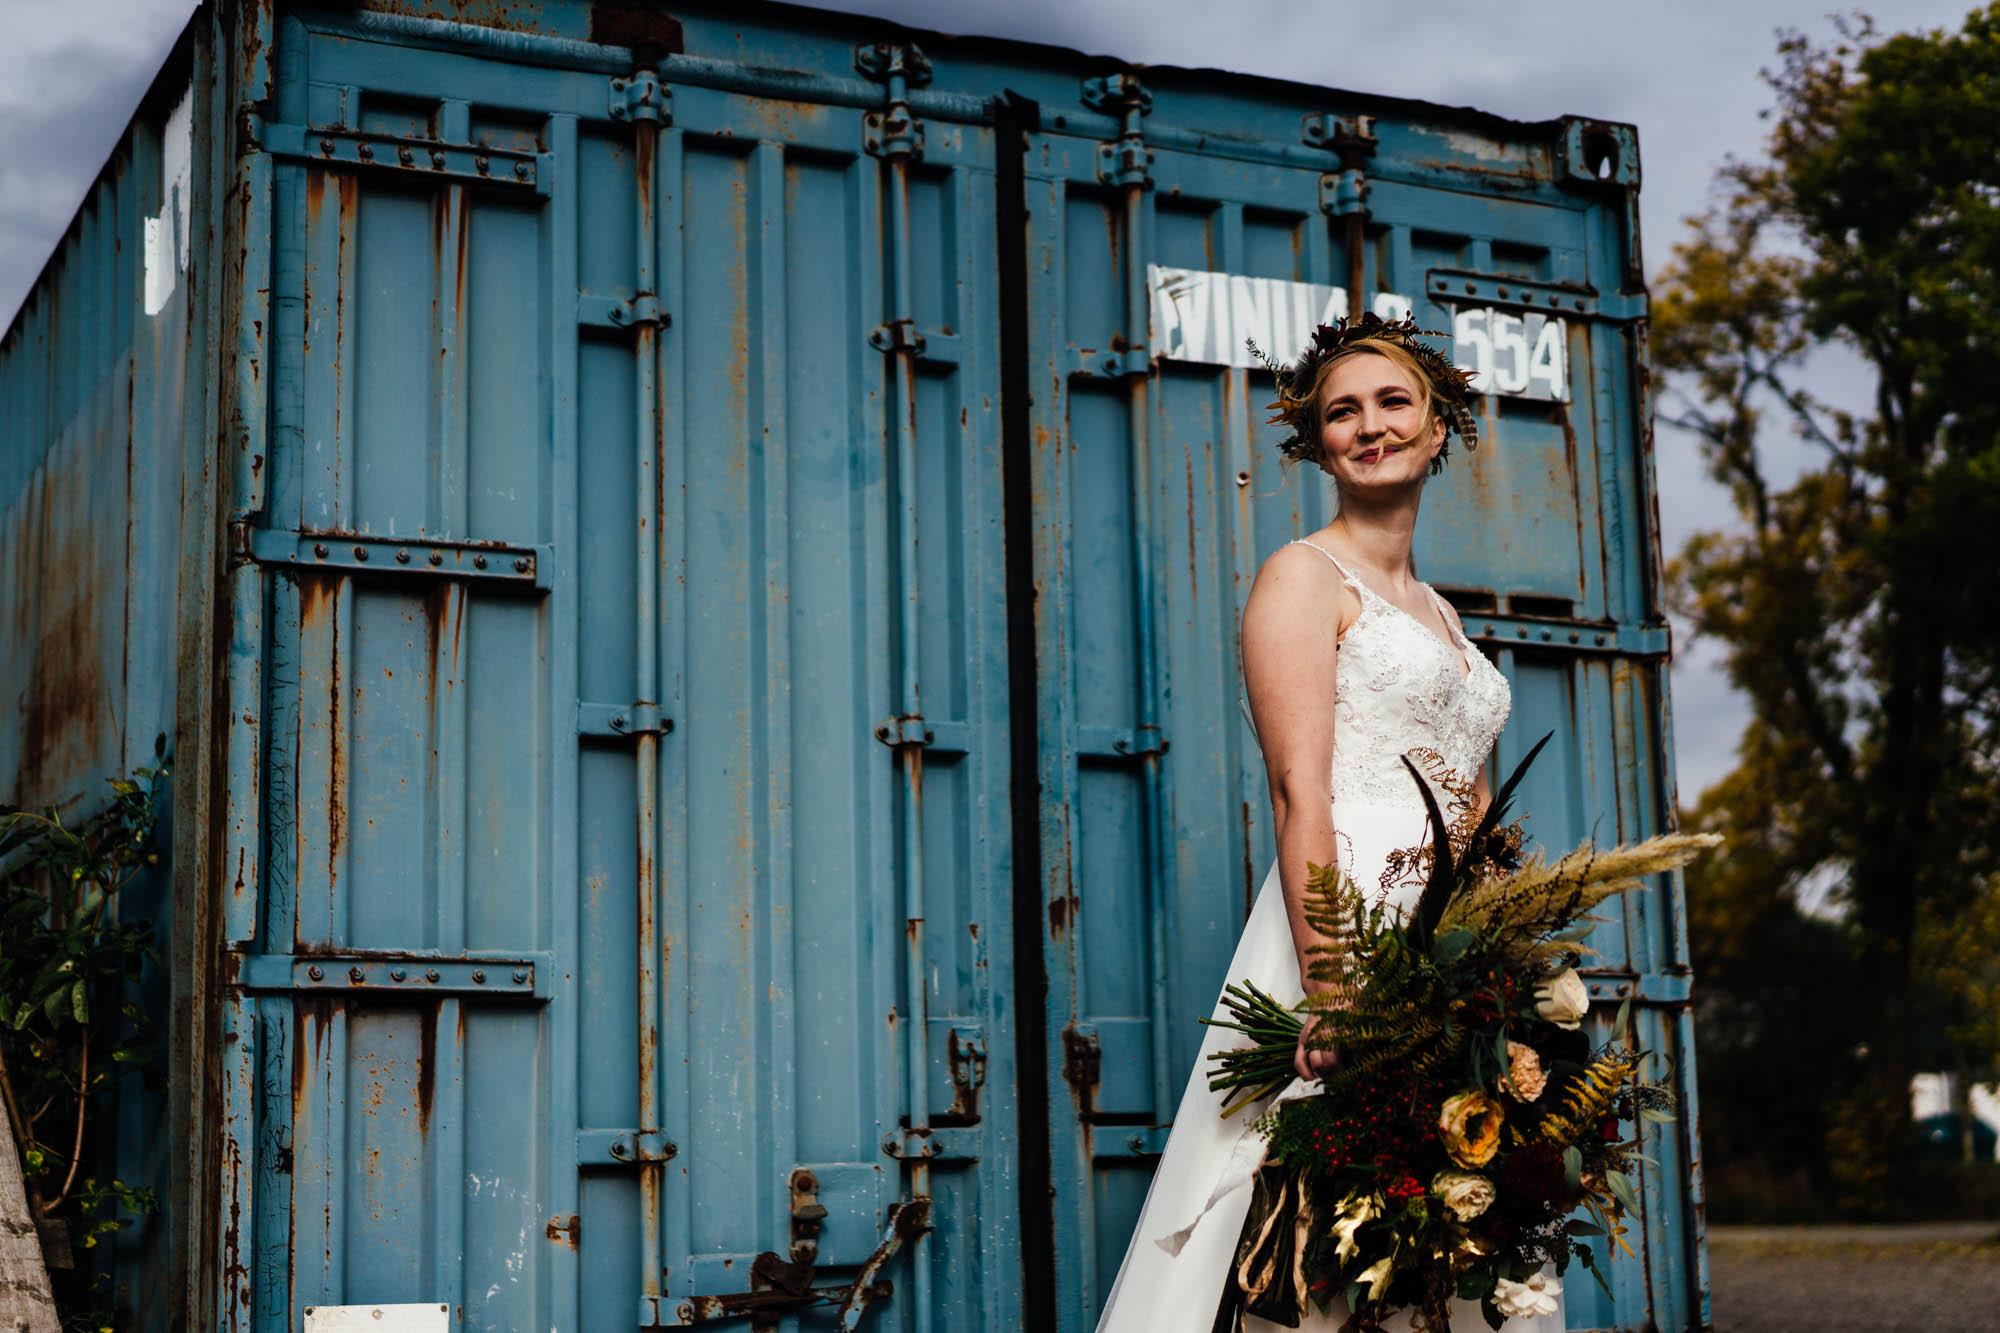 huntsmill-farm-wedding-inspiration-20